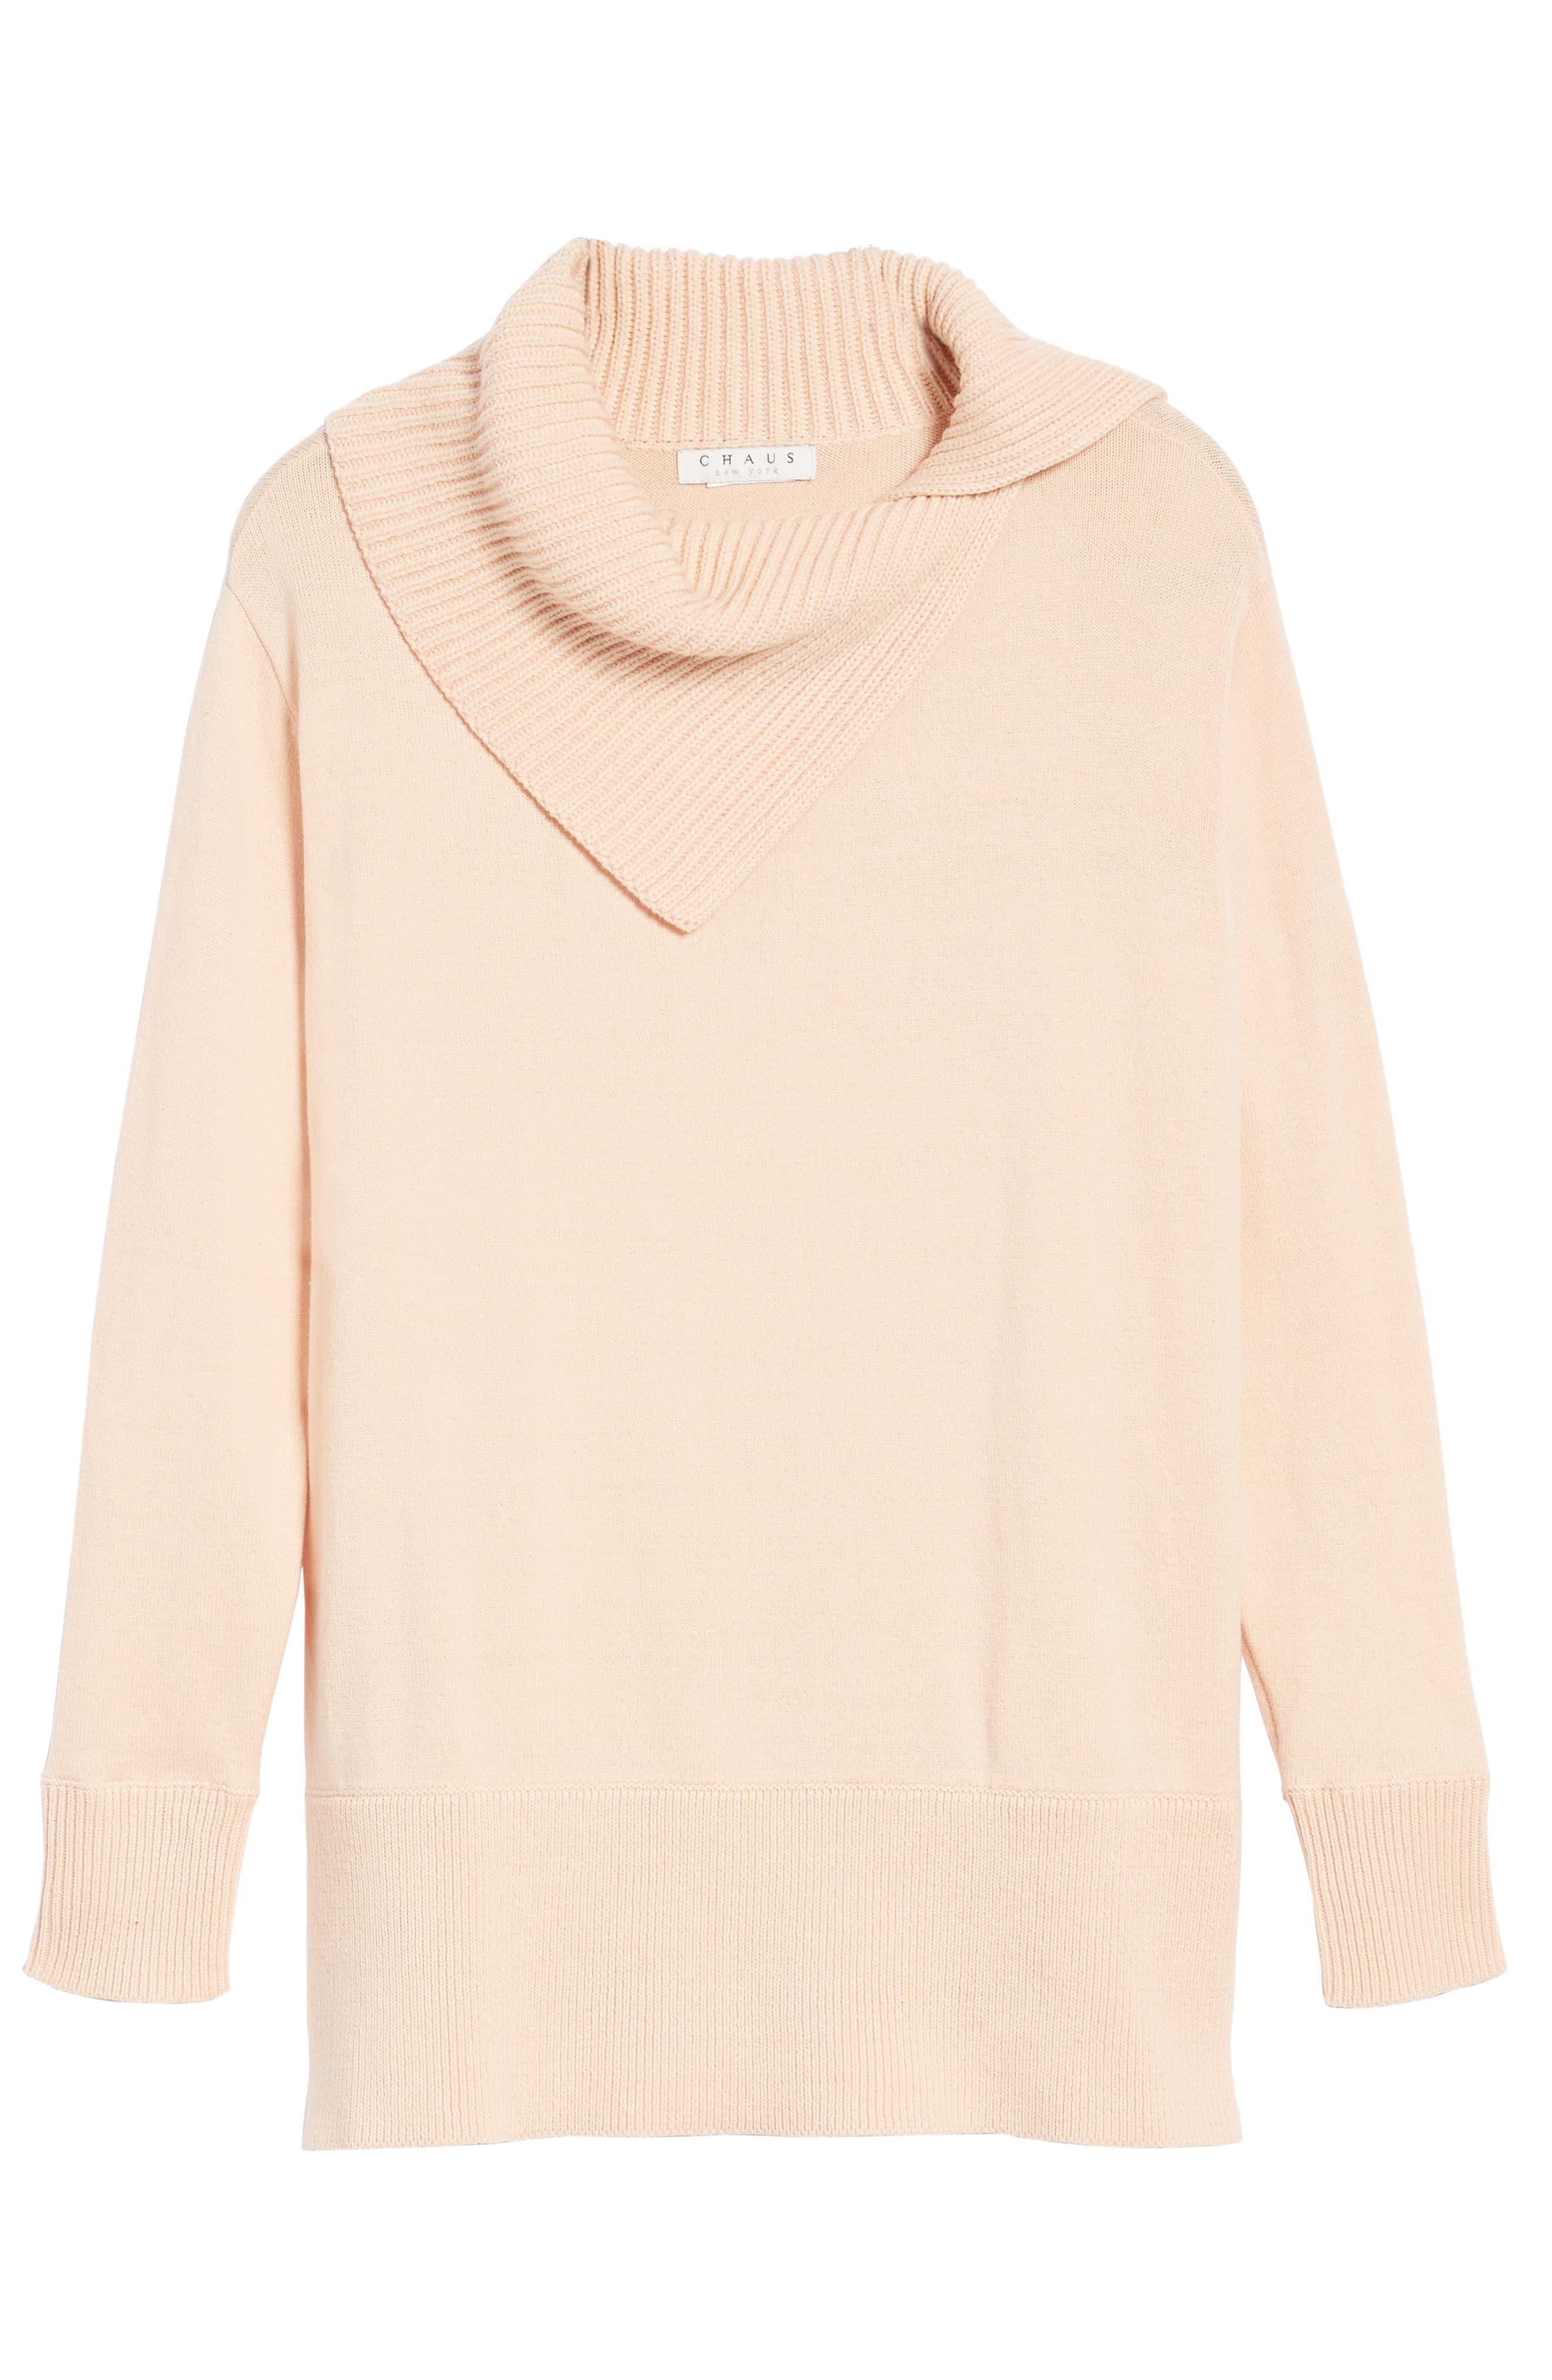 Cowl Neck Sweater,                             Alternate thumbnail 6, color,                             Blush